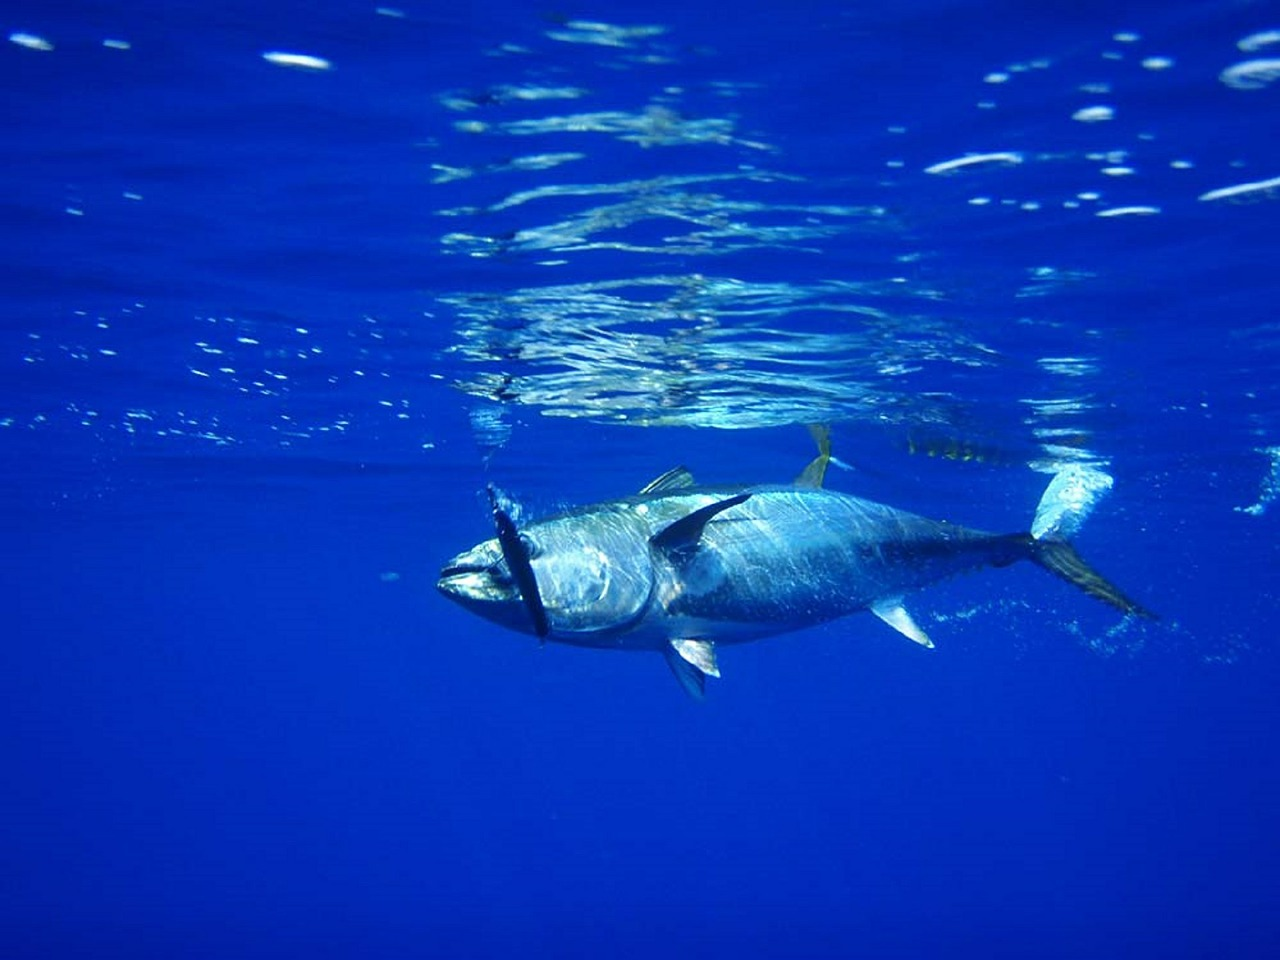 Thunfisch Angeln mit DJI Phantom 3 Professional Drohne